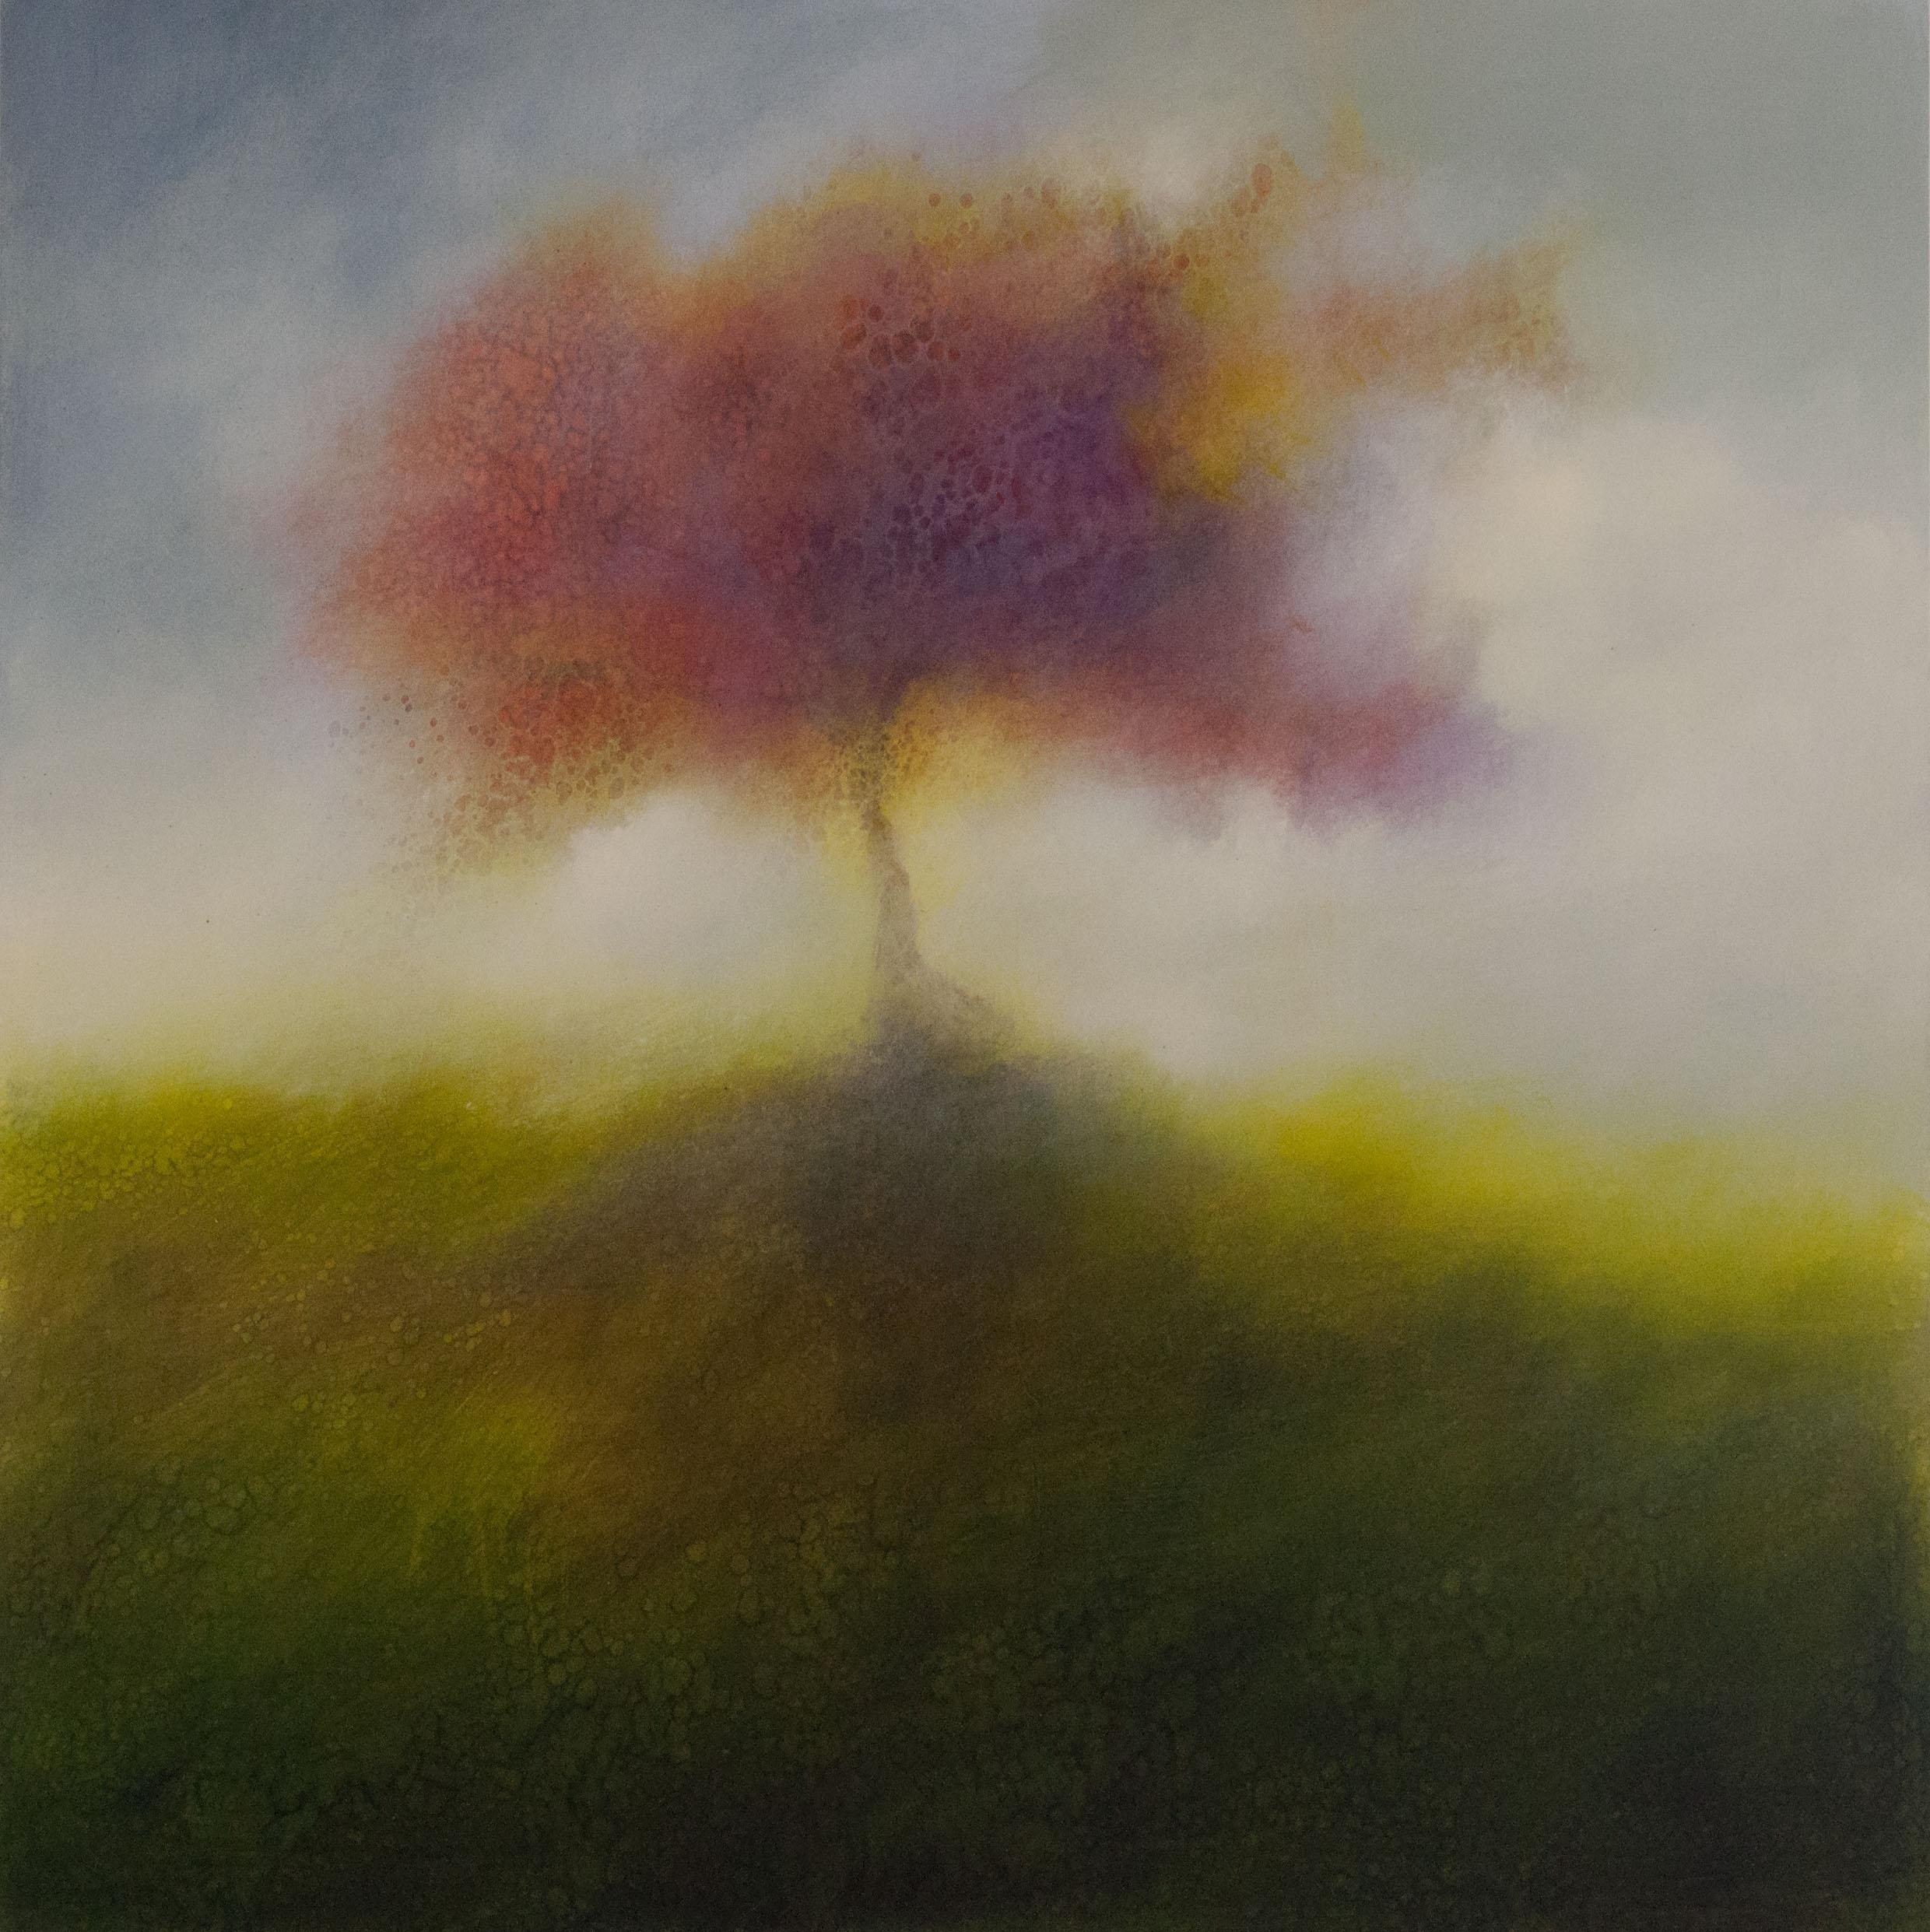 310-Tree-Grows-Alone-30x30-SOLD-1.jpg